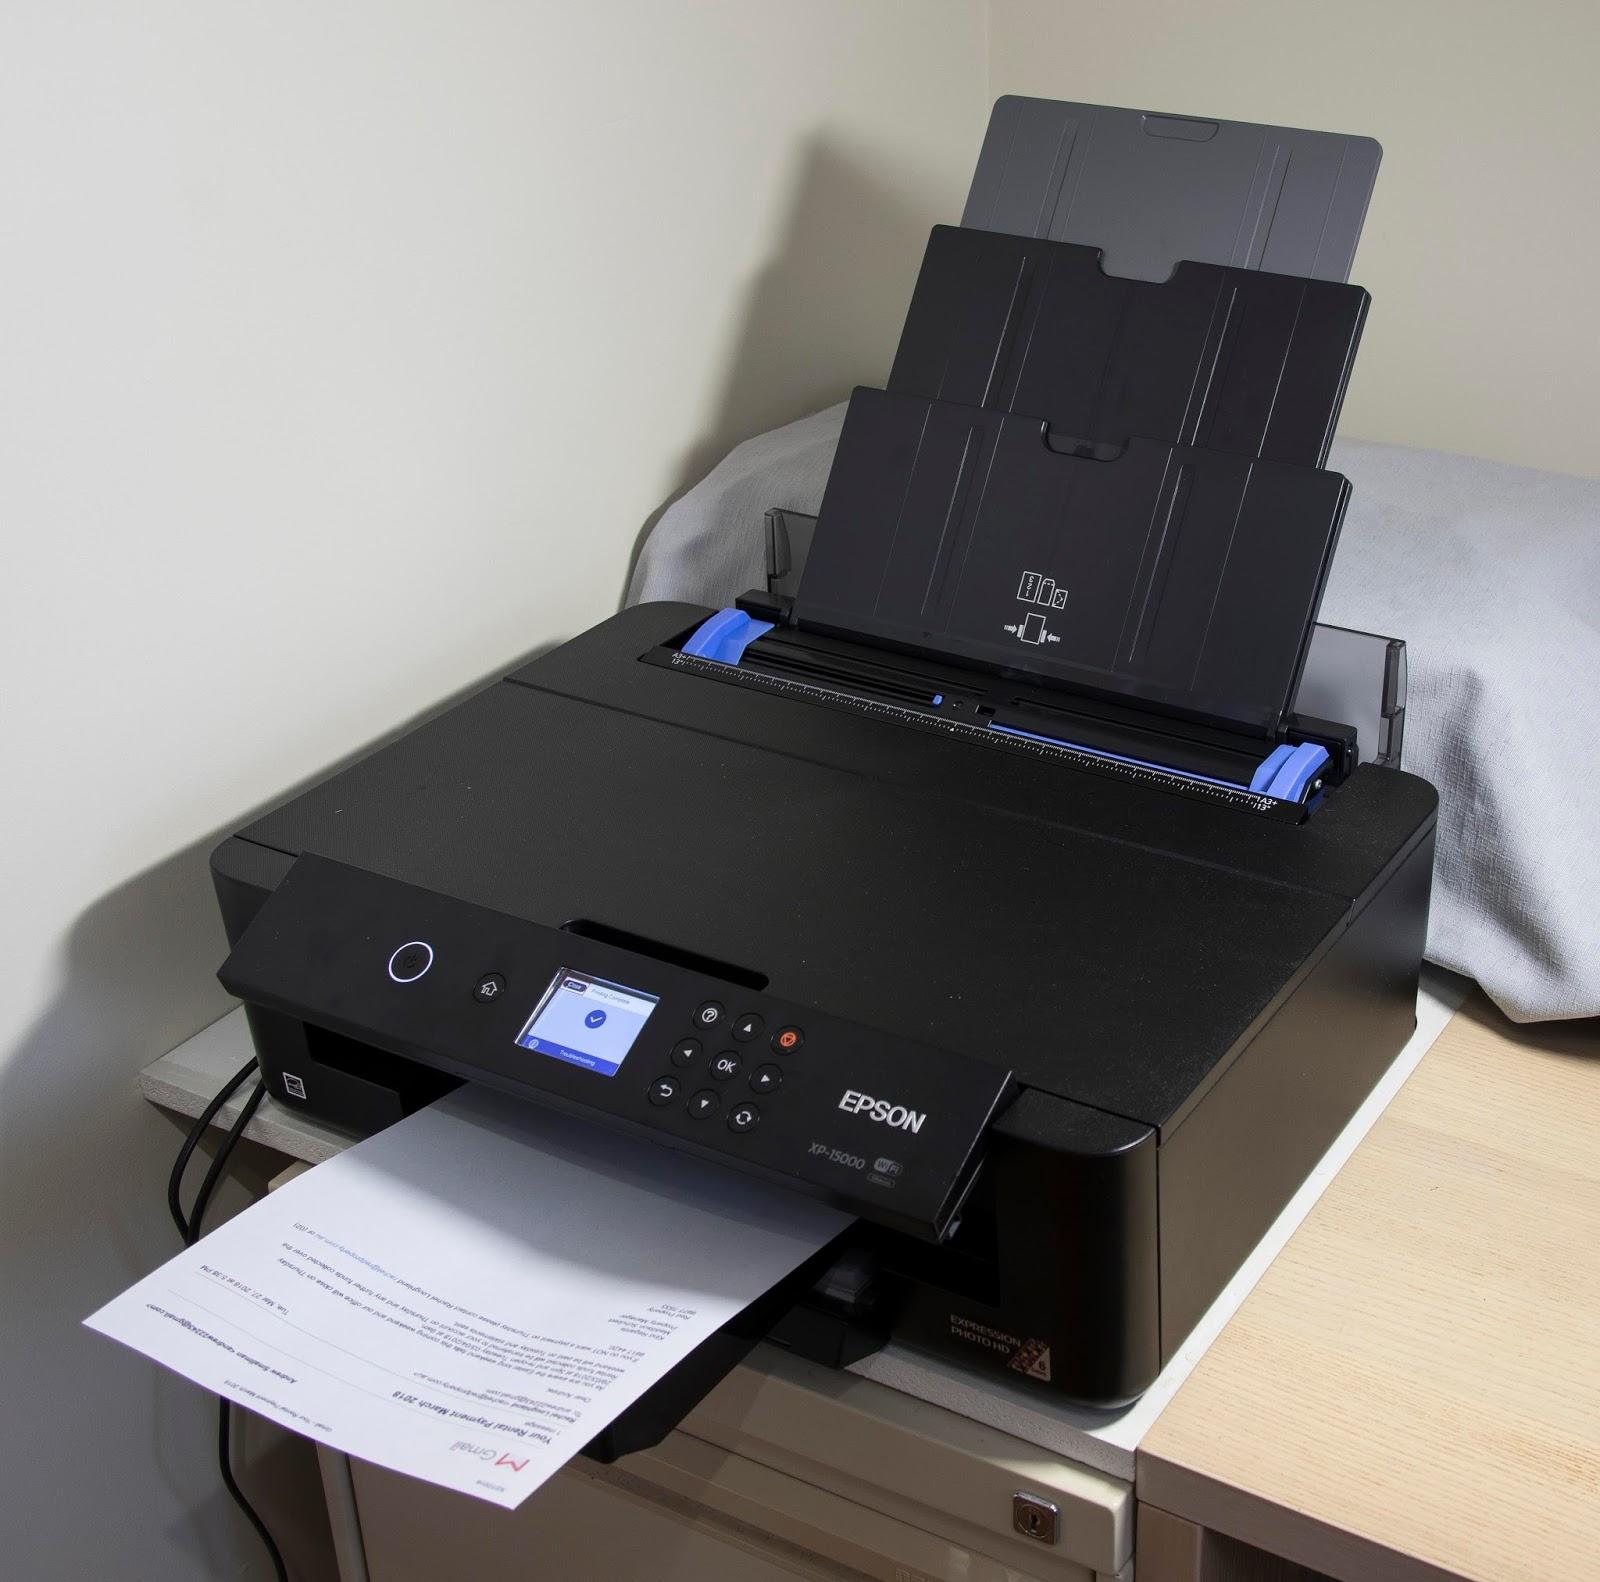 epson xp 15000 printer review 30 march 2018 camera ergonomics